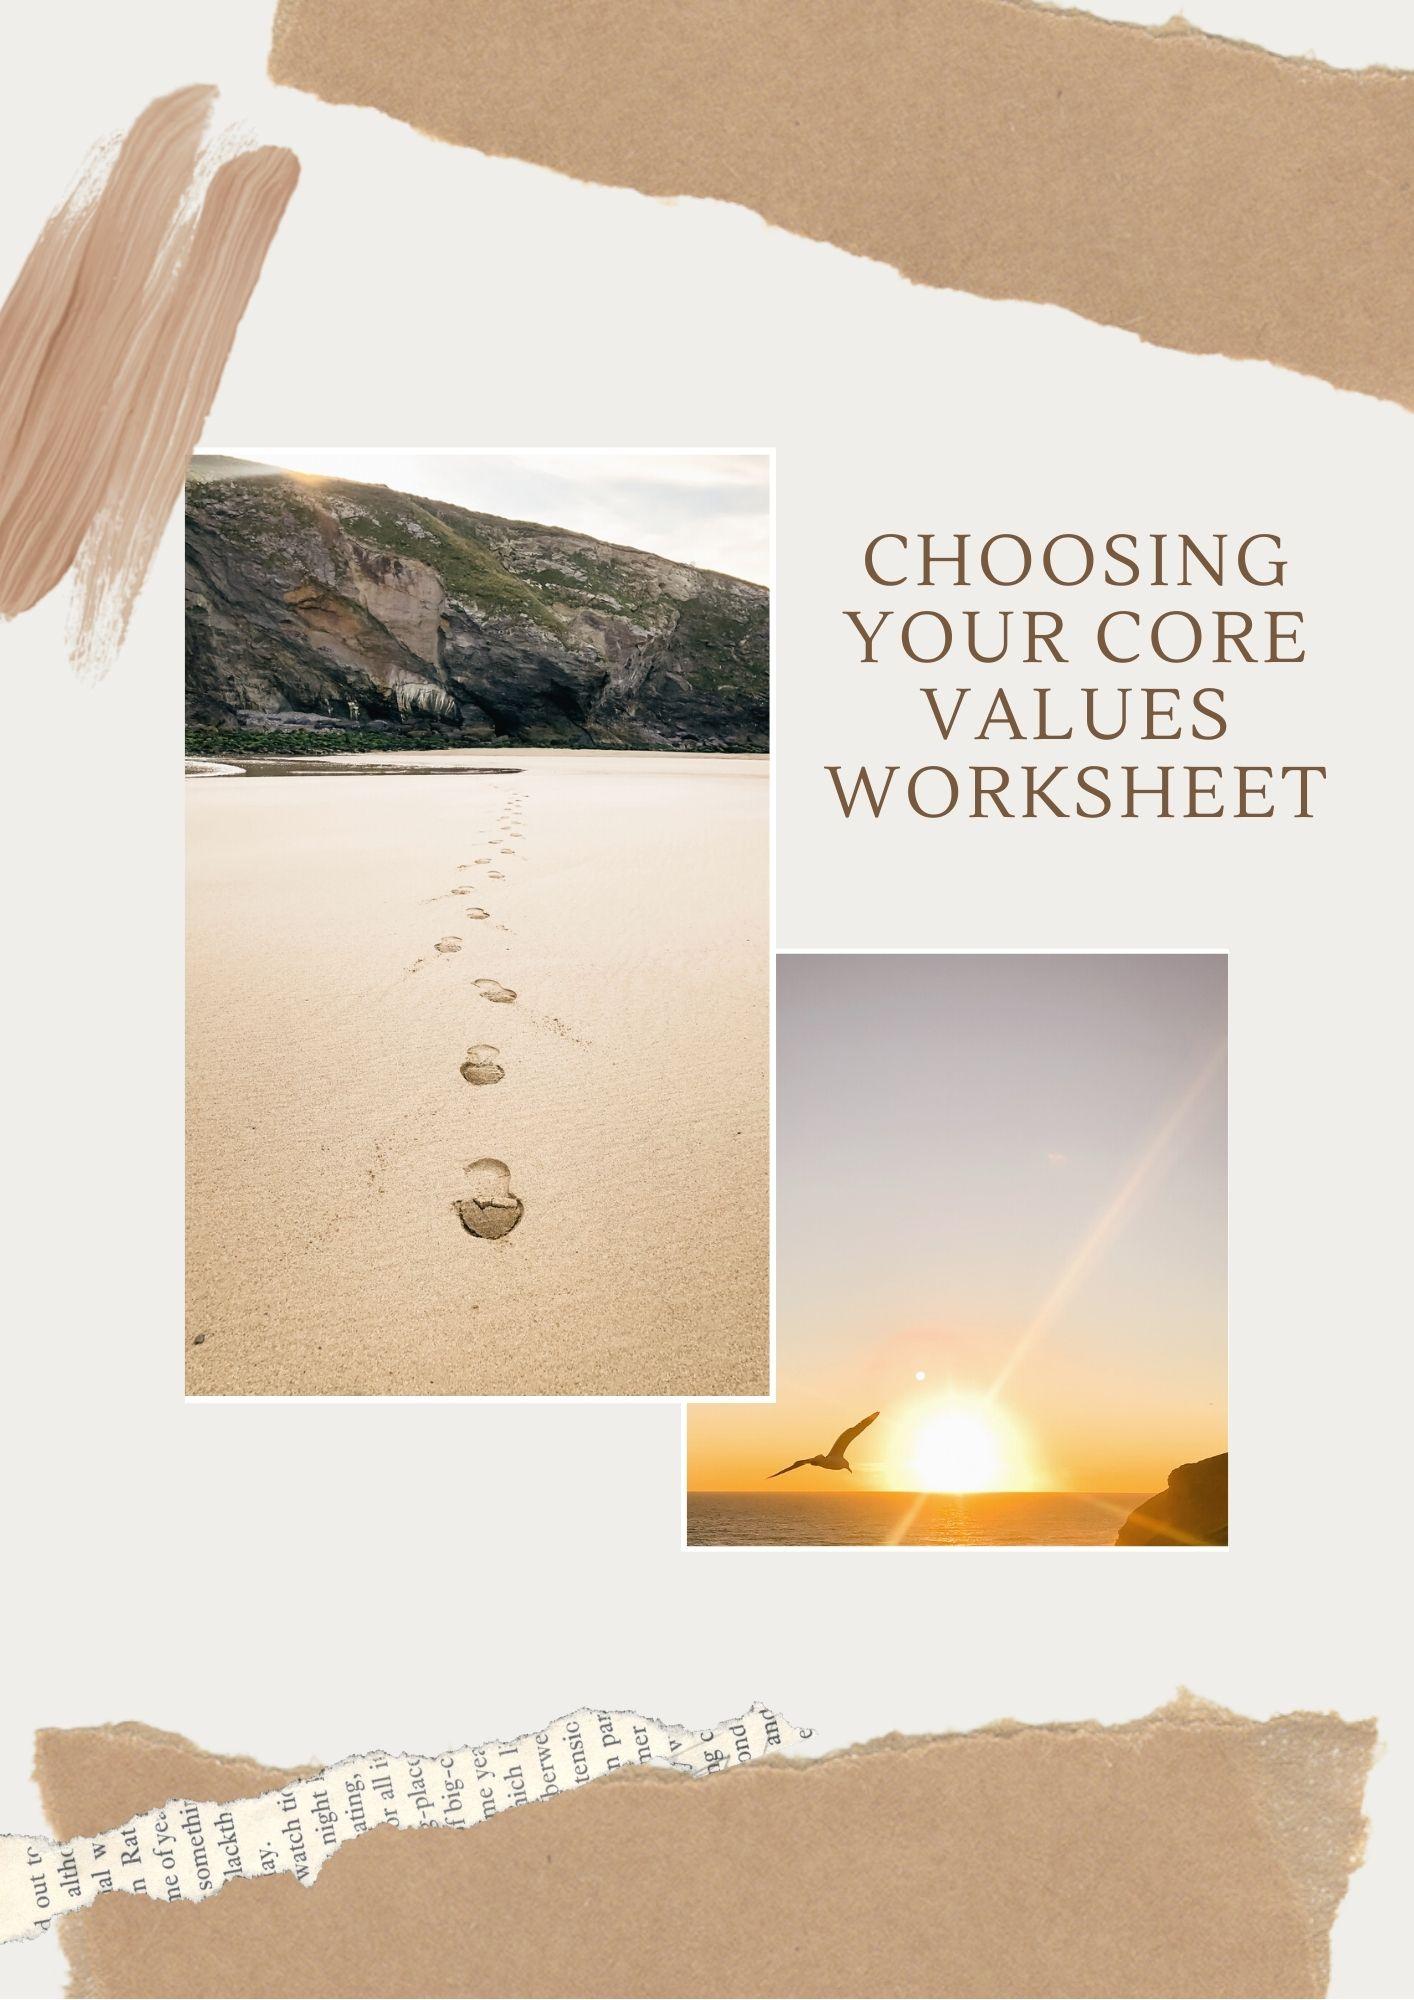 Choosing Your Core Values Worksheet